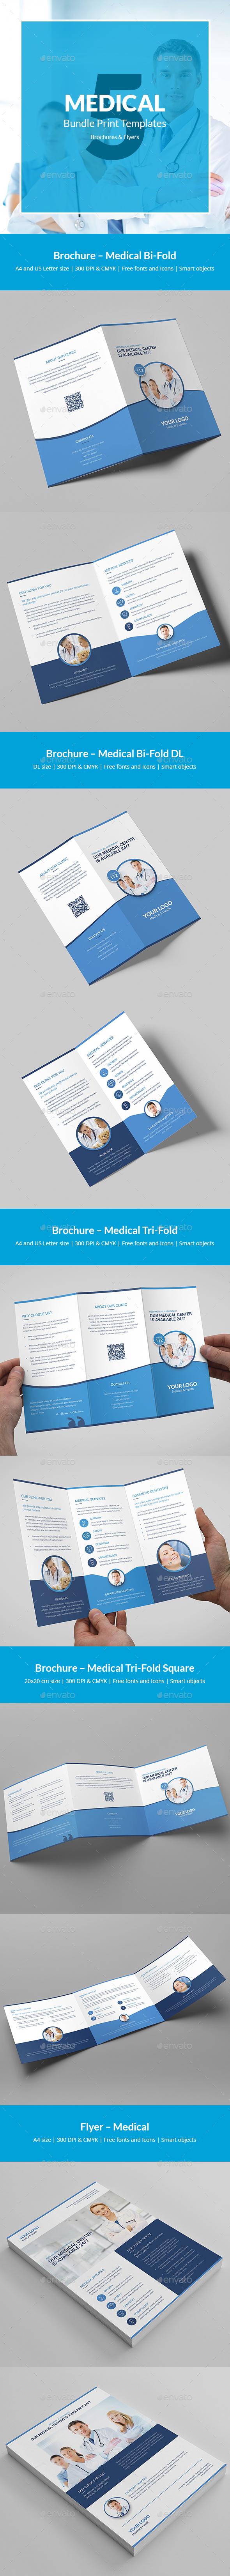 Medical – Brochures Bundle Print Templates 5 in 1 - Corporate Brochures